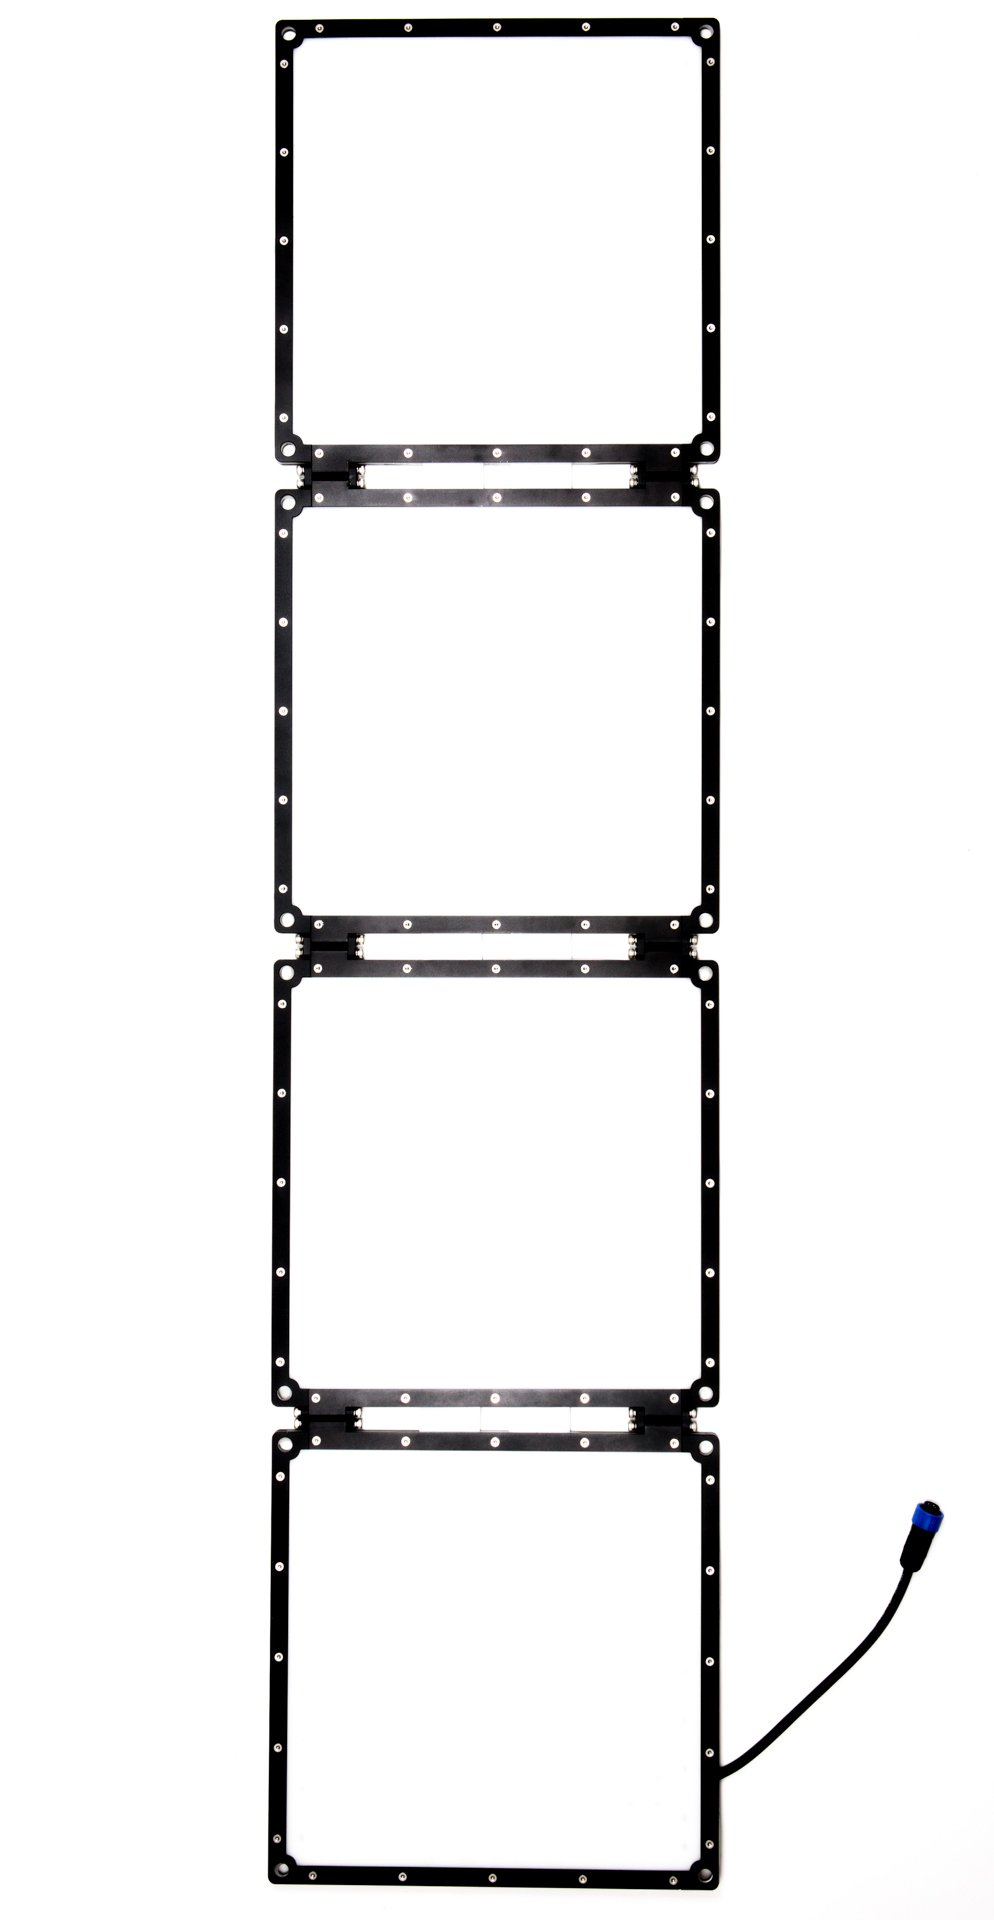 Aladdin BI-FOLD4 V-Mount Kit 200W Bi-Color Soft LED Light Kit with Dimmer and Gold Mount Battery Plate AMS-FD200BIKIT-VM